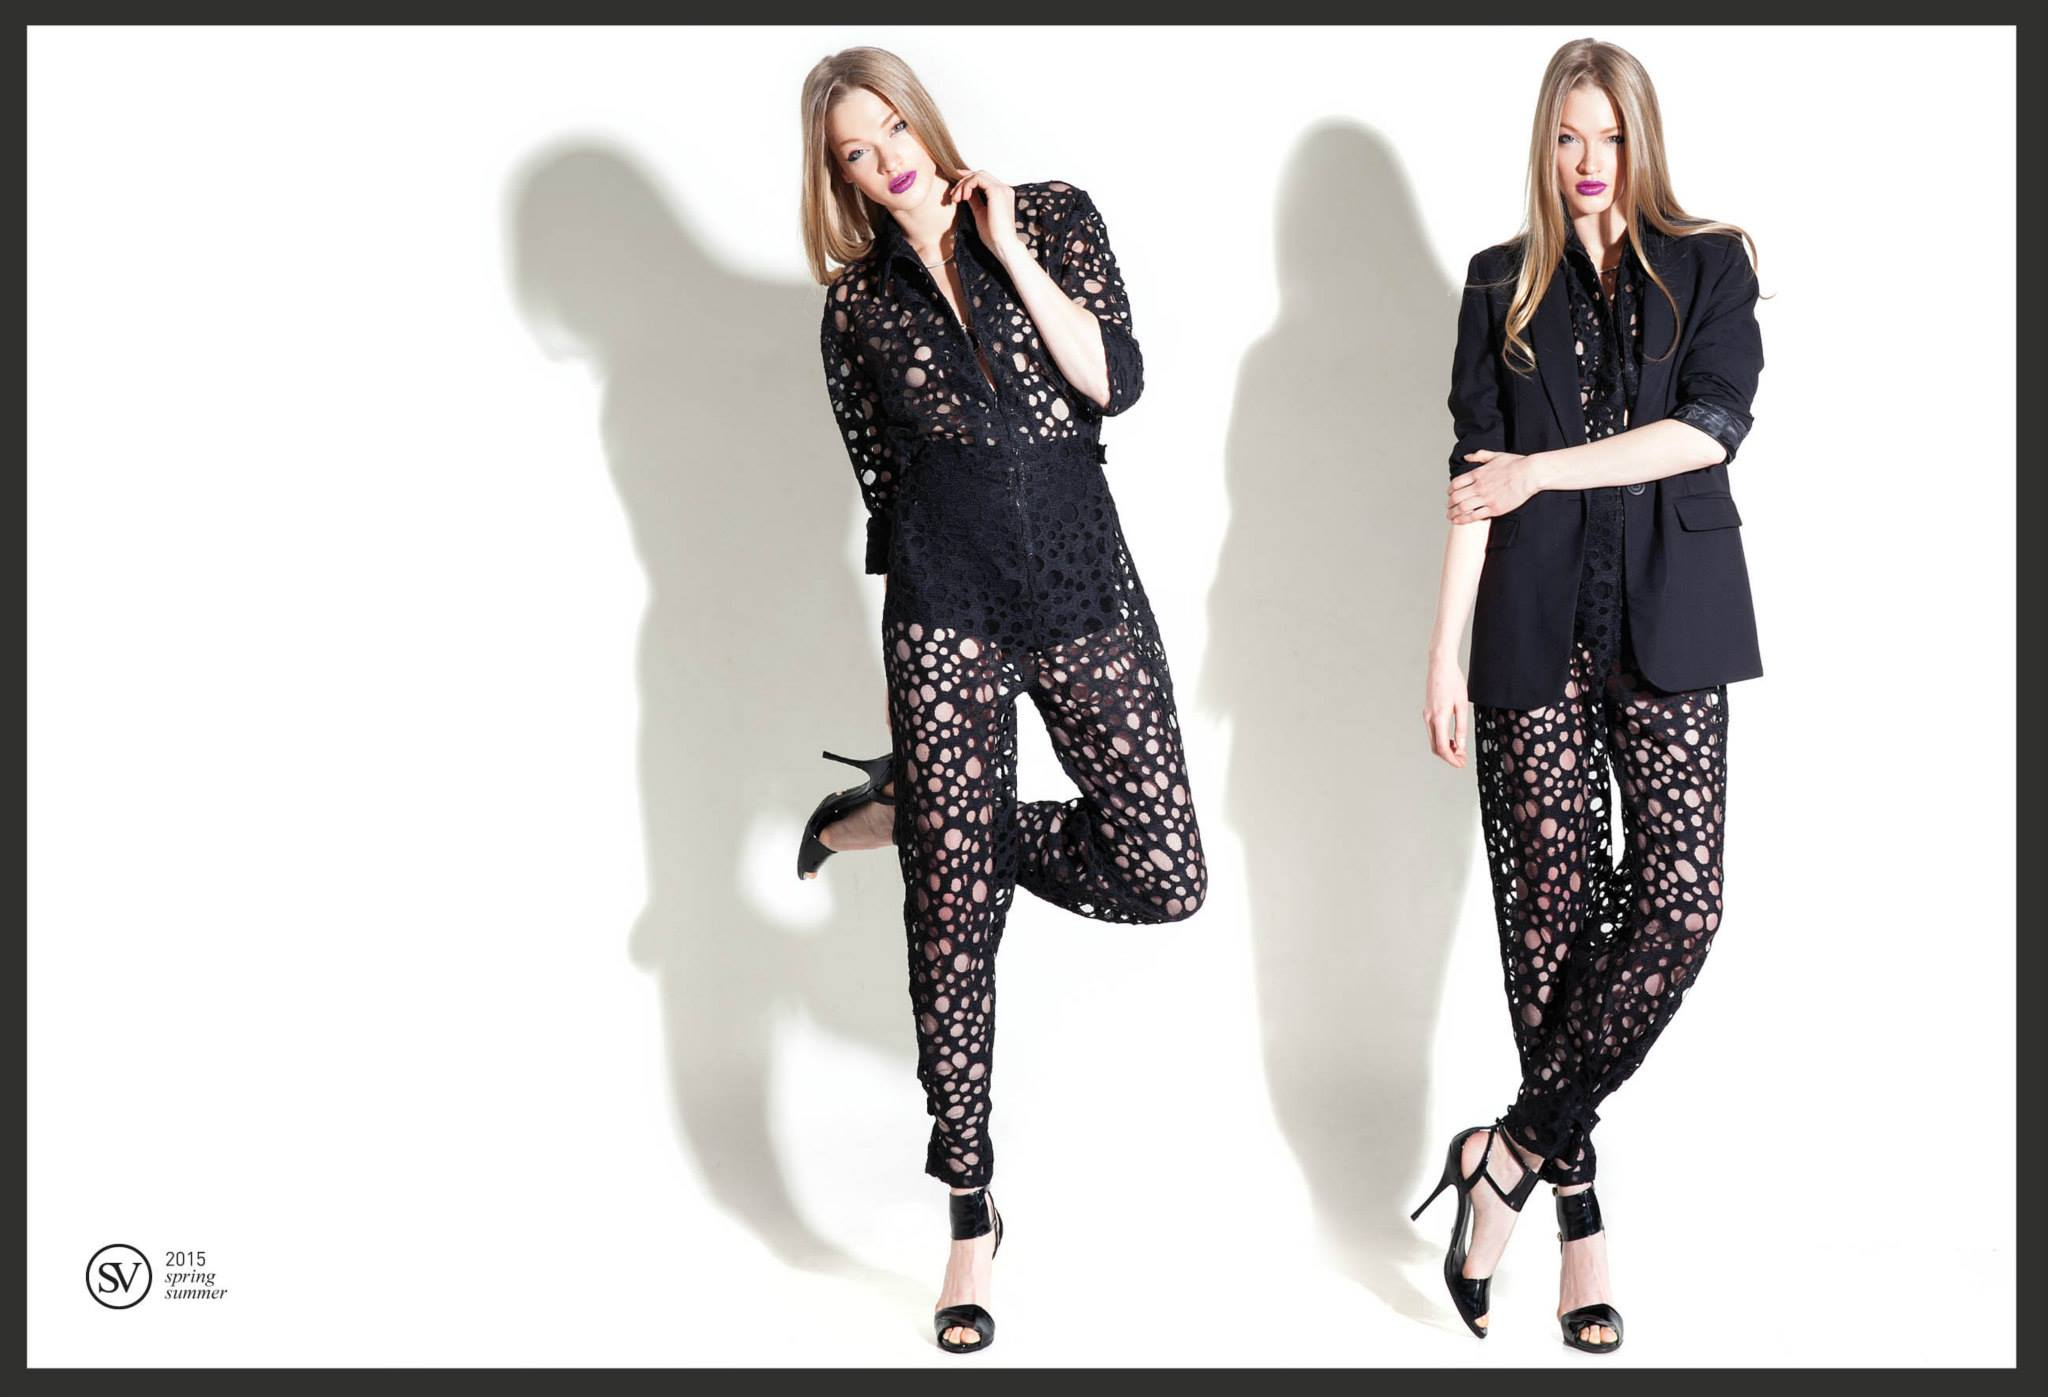 Hair Shiny secrets pictures, 10 wear to ways a leopard coat